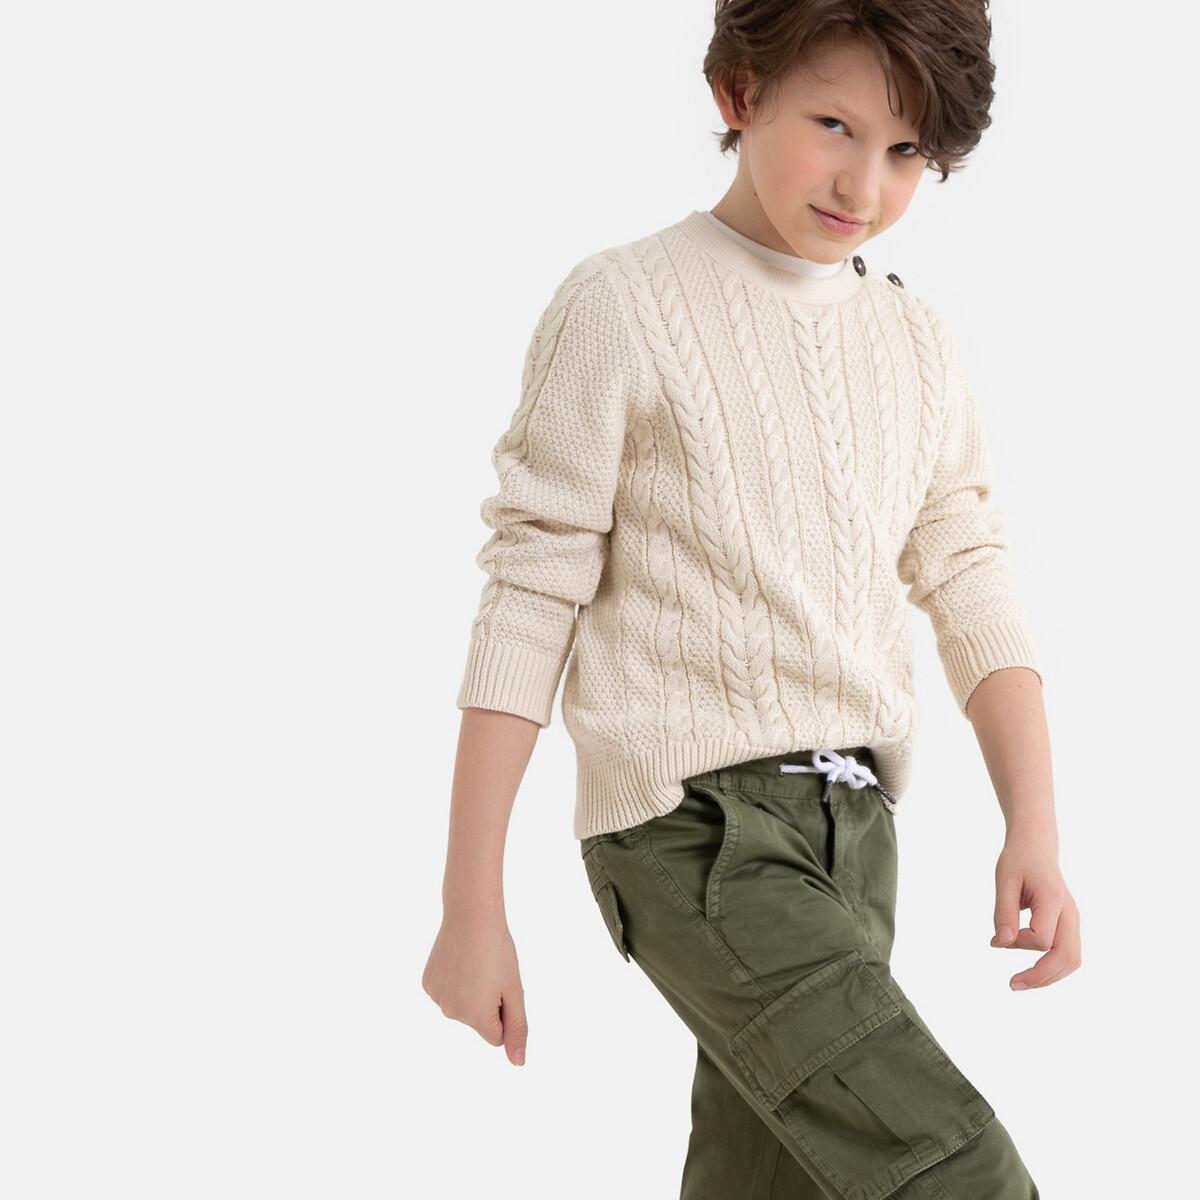 Пуловер La Redoute С круглым вырезом и витым узором 8 лет - 126 см бежевый абажур la redoute с зигзагообразным узором wombat диаметр 35 см бежевый